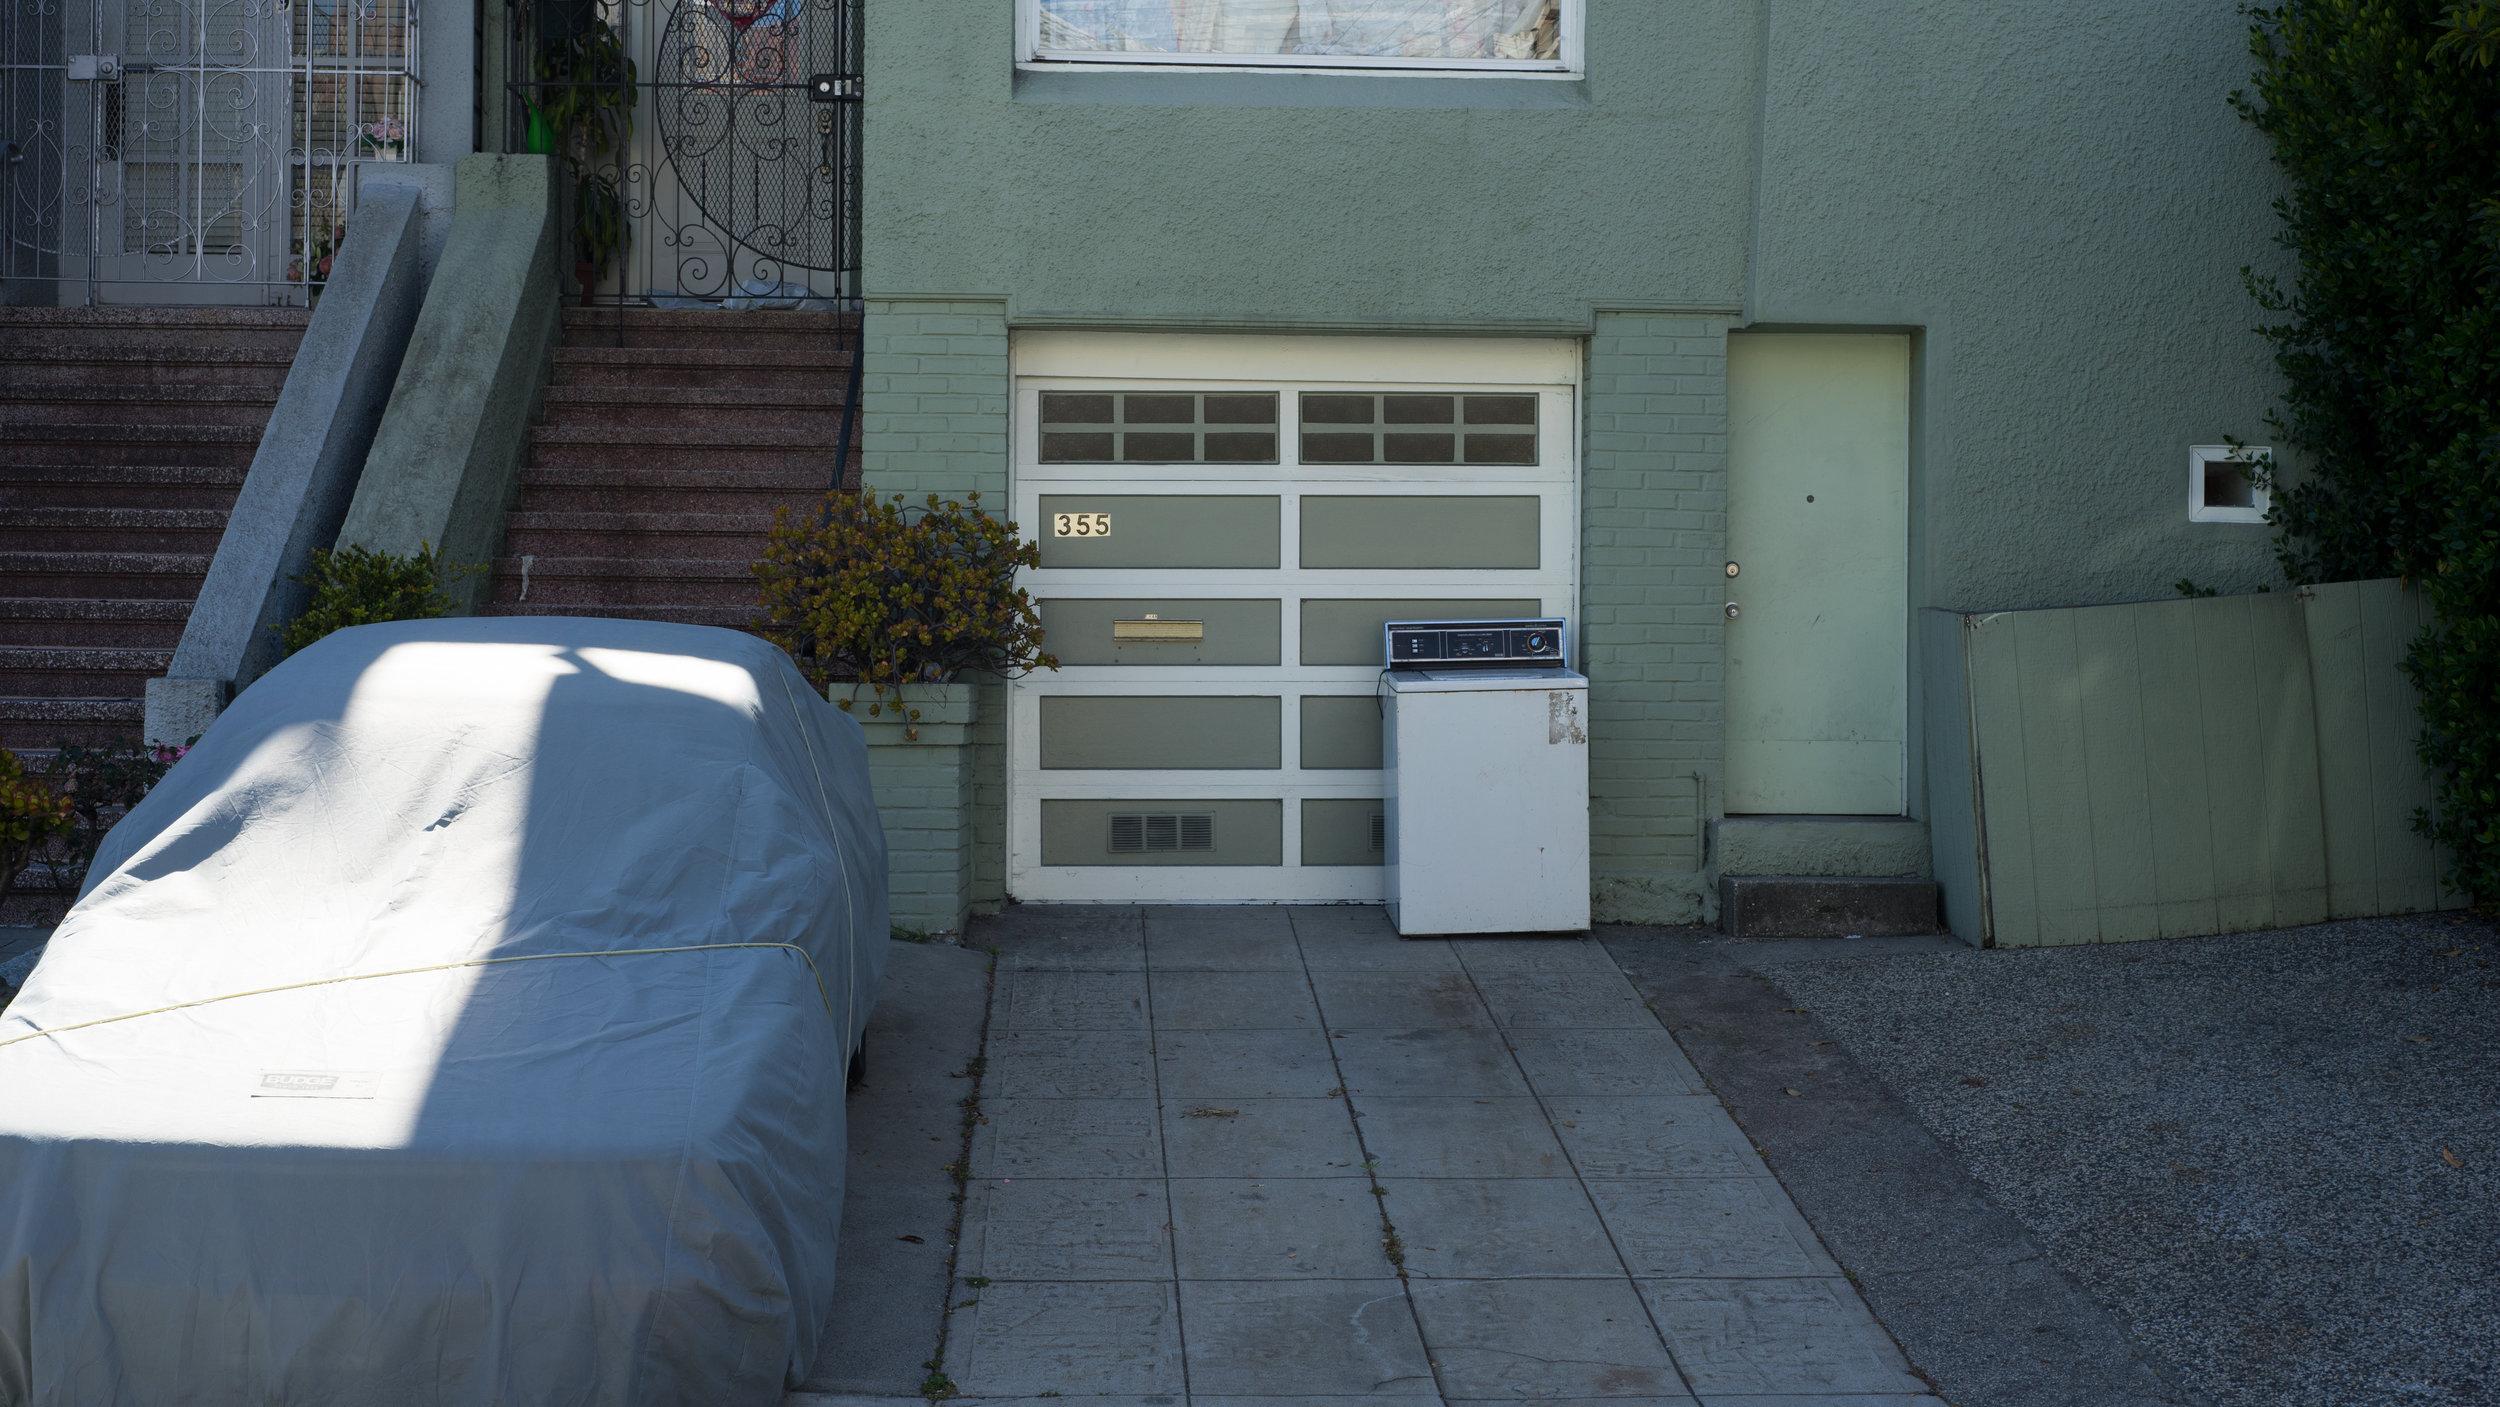 Garage, San Francisco, CA, 2017